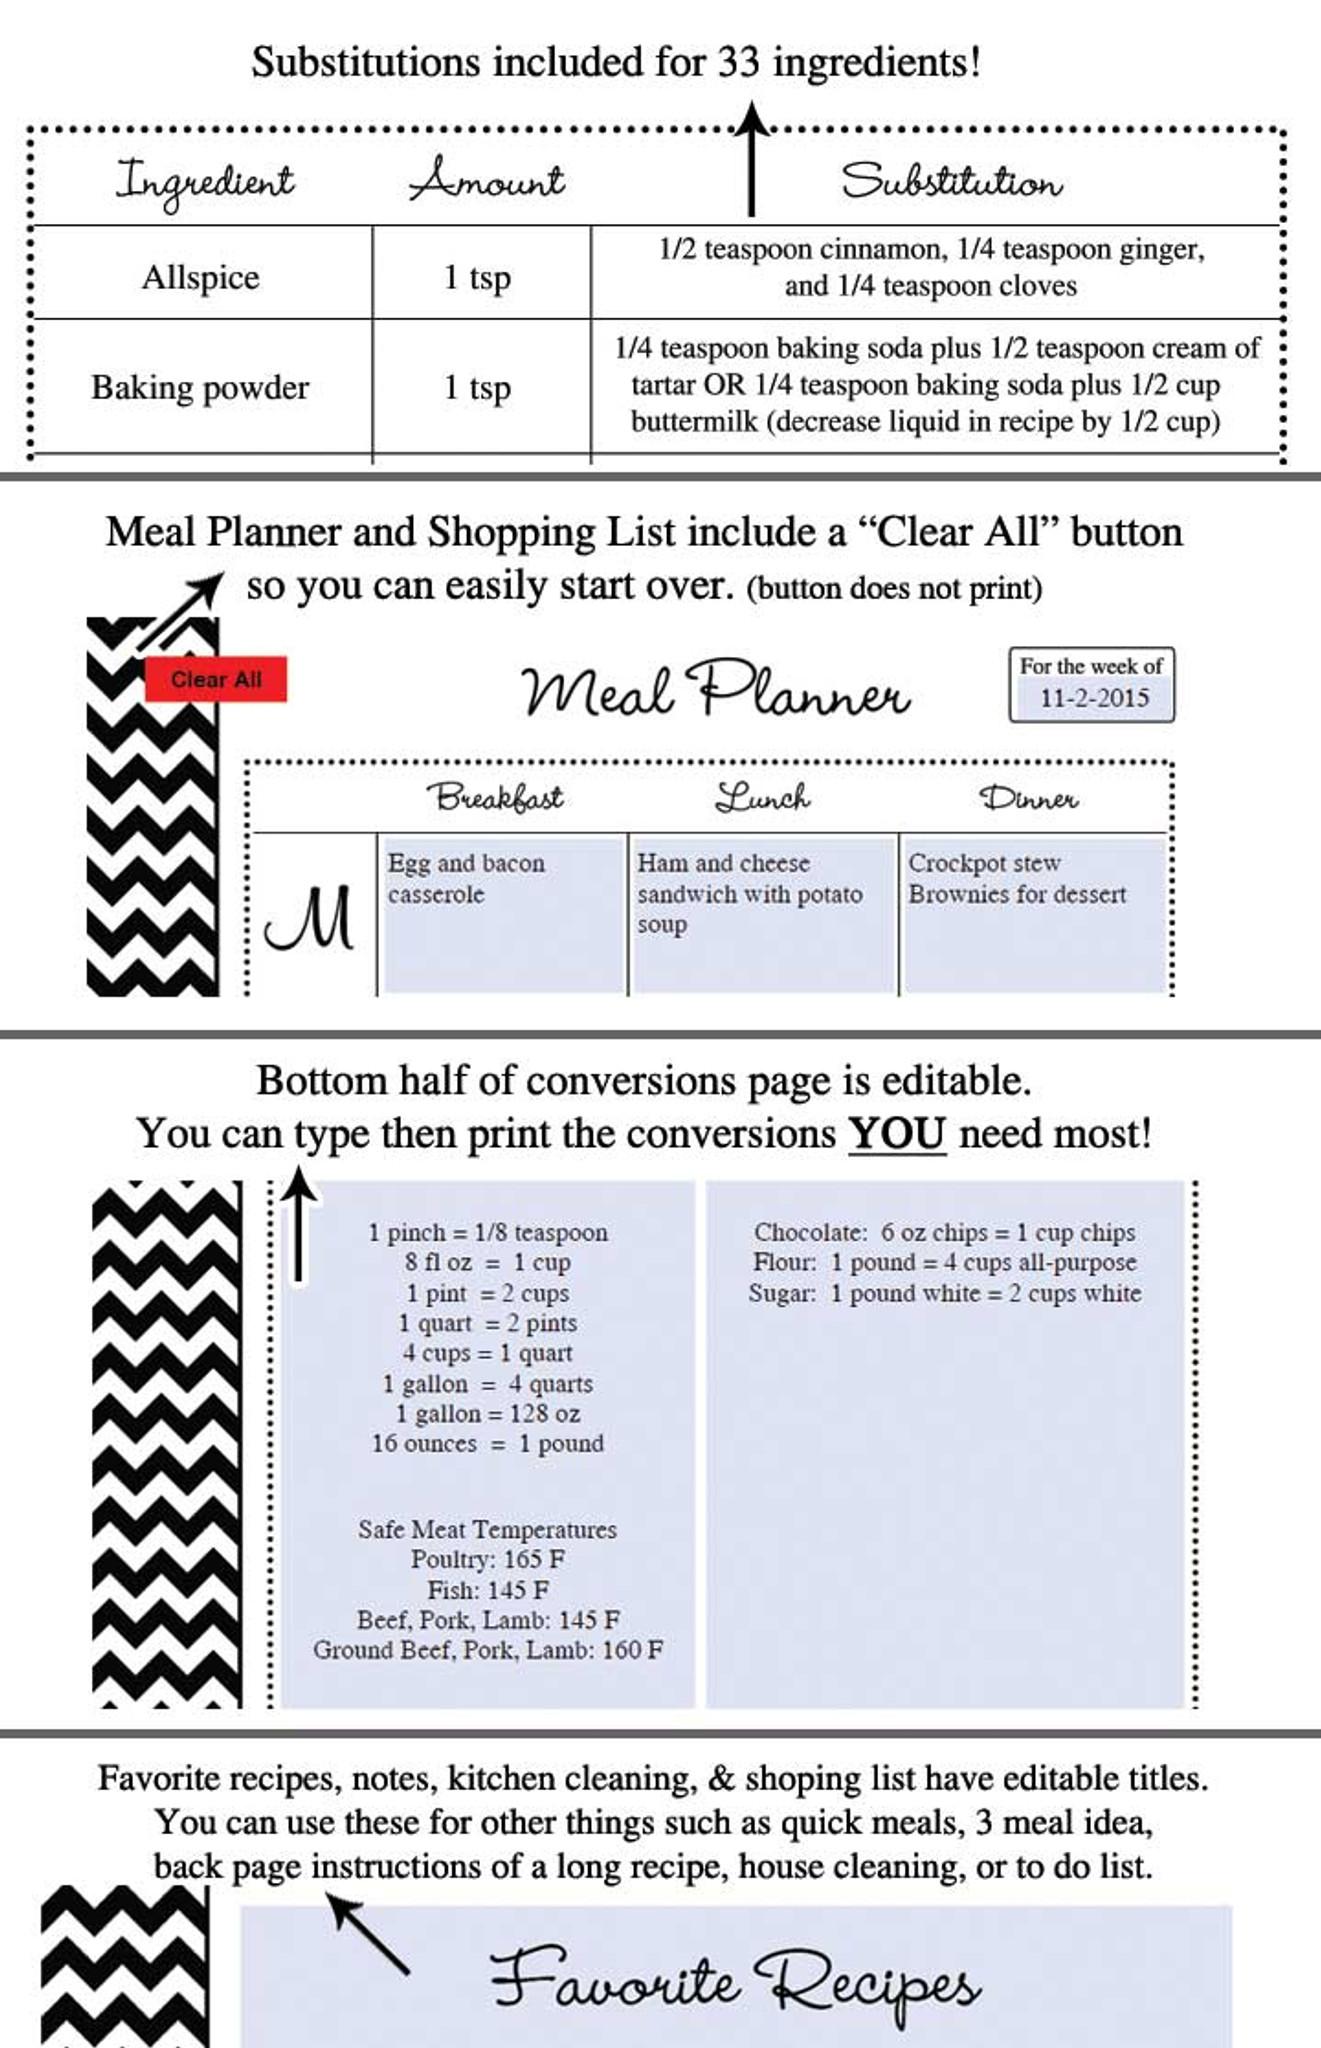 black chevron printable recipe book template editable pdf